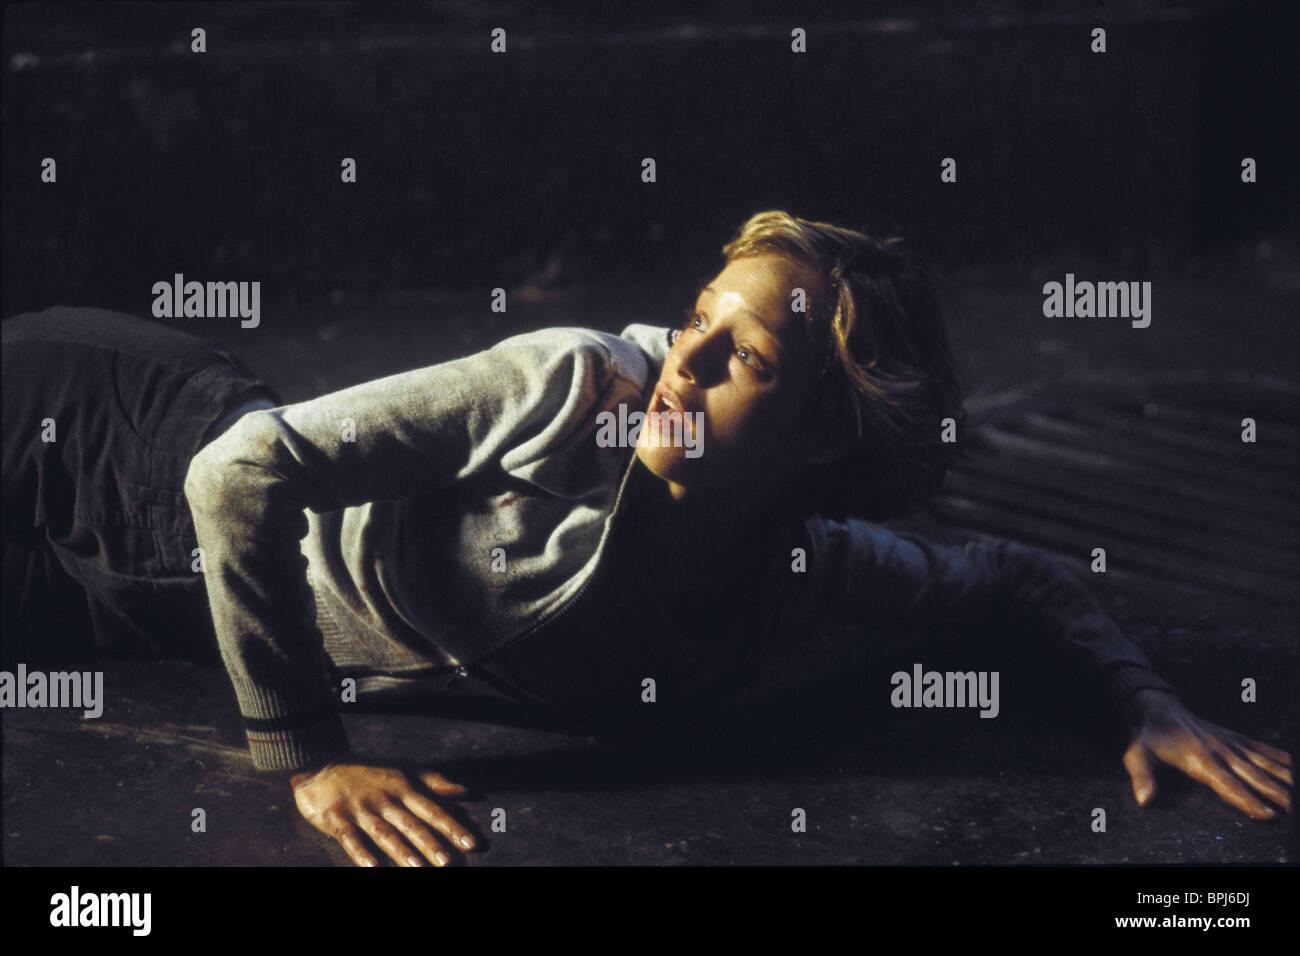 LAURA REGAN WES CRAVEN PRESENTS: THEY (2002) - Stock Image